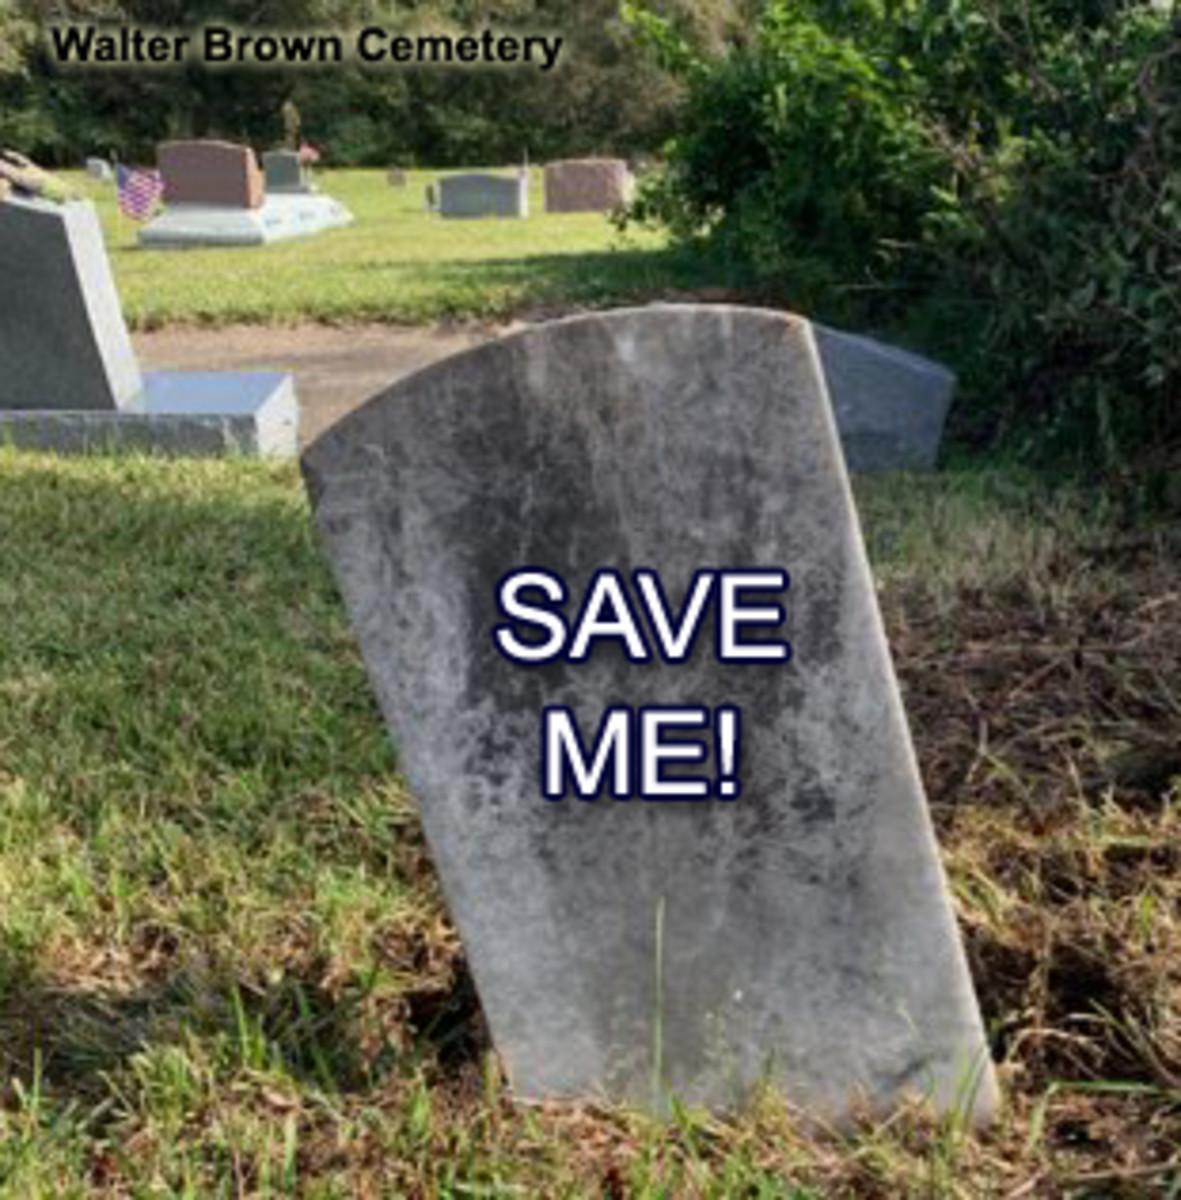 historic-black-cemetery-sheds-light-on-hidden-history